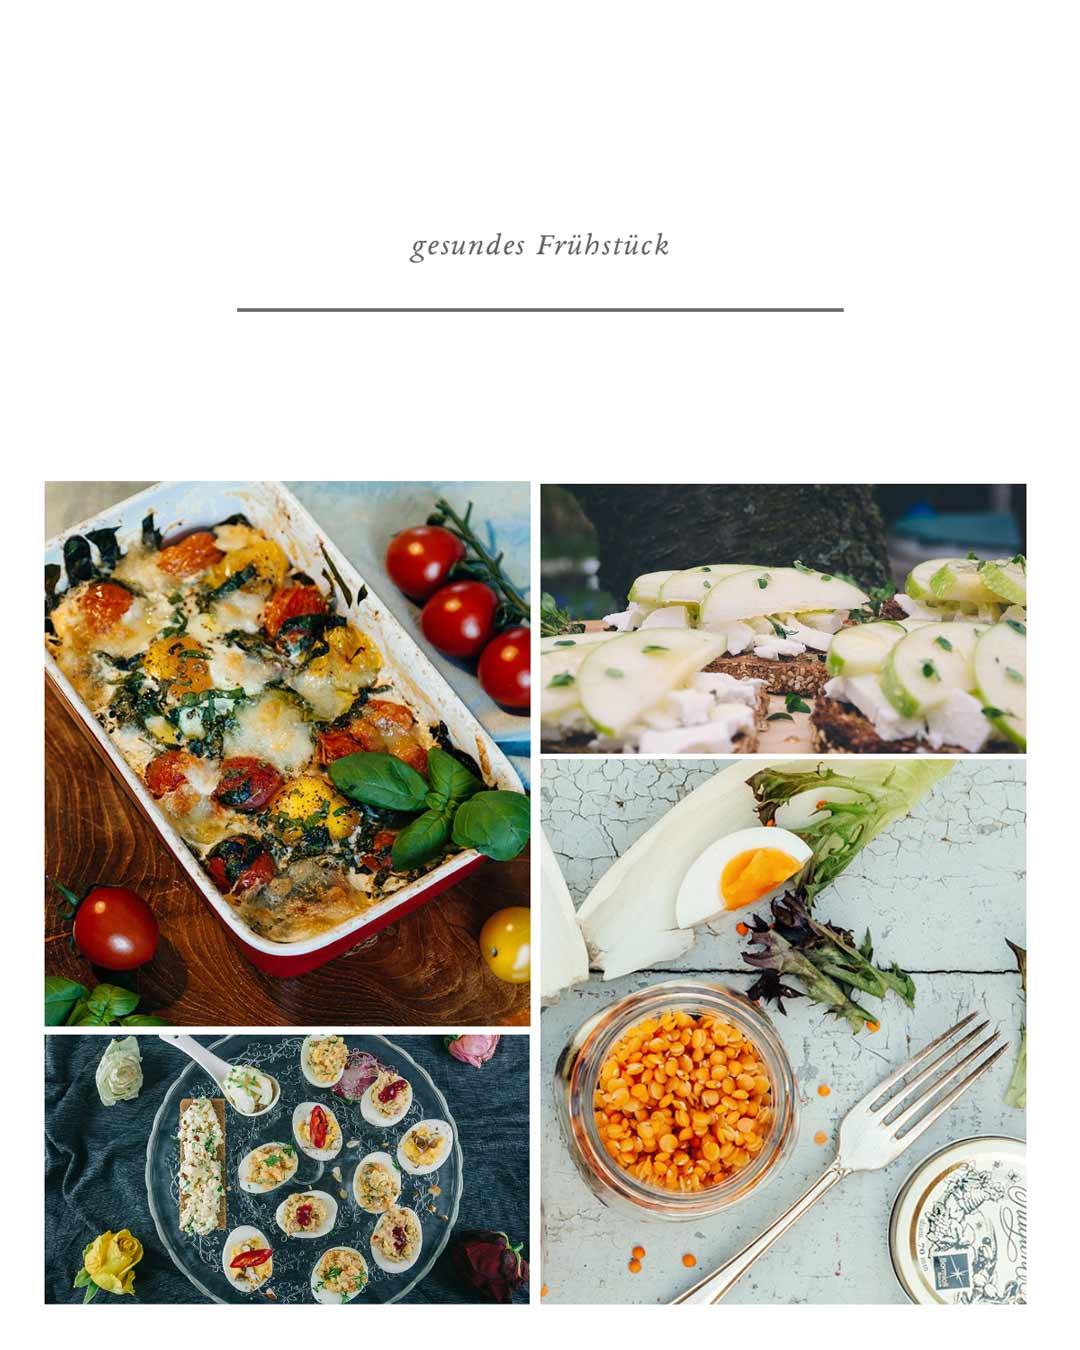 gesundes frühstück rezepte, gesundes frühstück abnehmen, gesundes frühstück rezept, gesundes essen, gesundes frühstück haferflocken, gesundes schnelles frühstück, gesunde ernährung, gesundes kalorienarmes frühstück